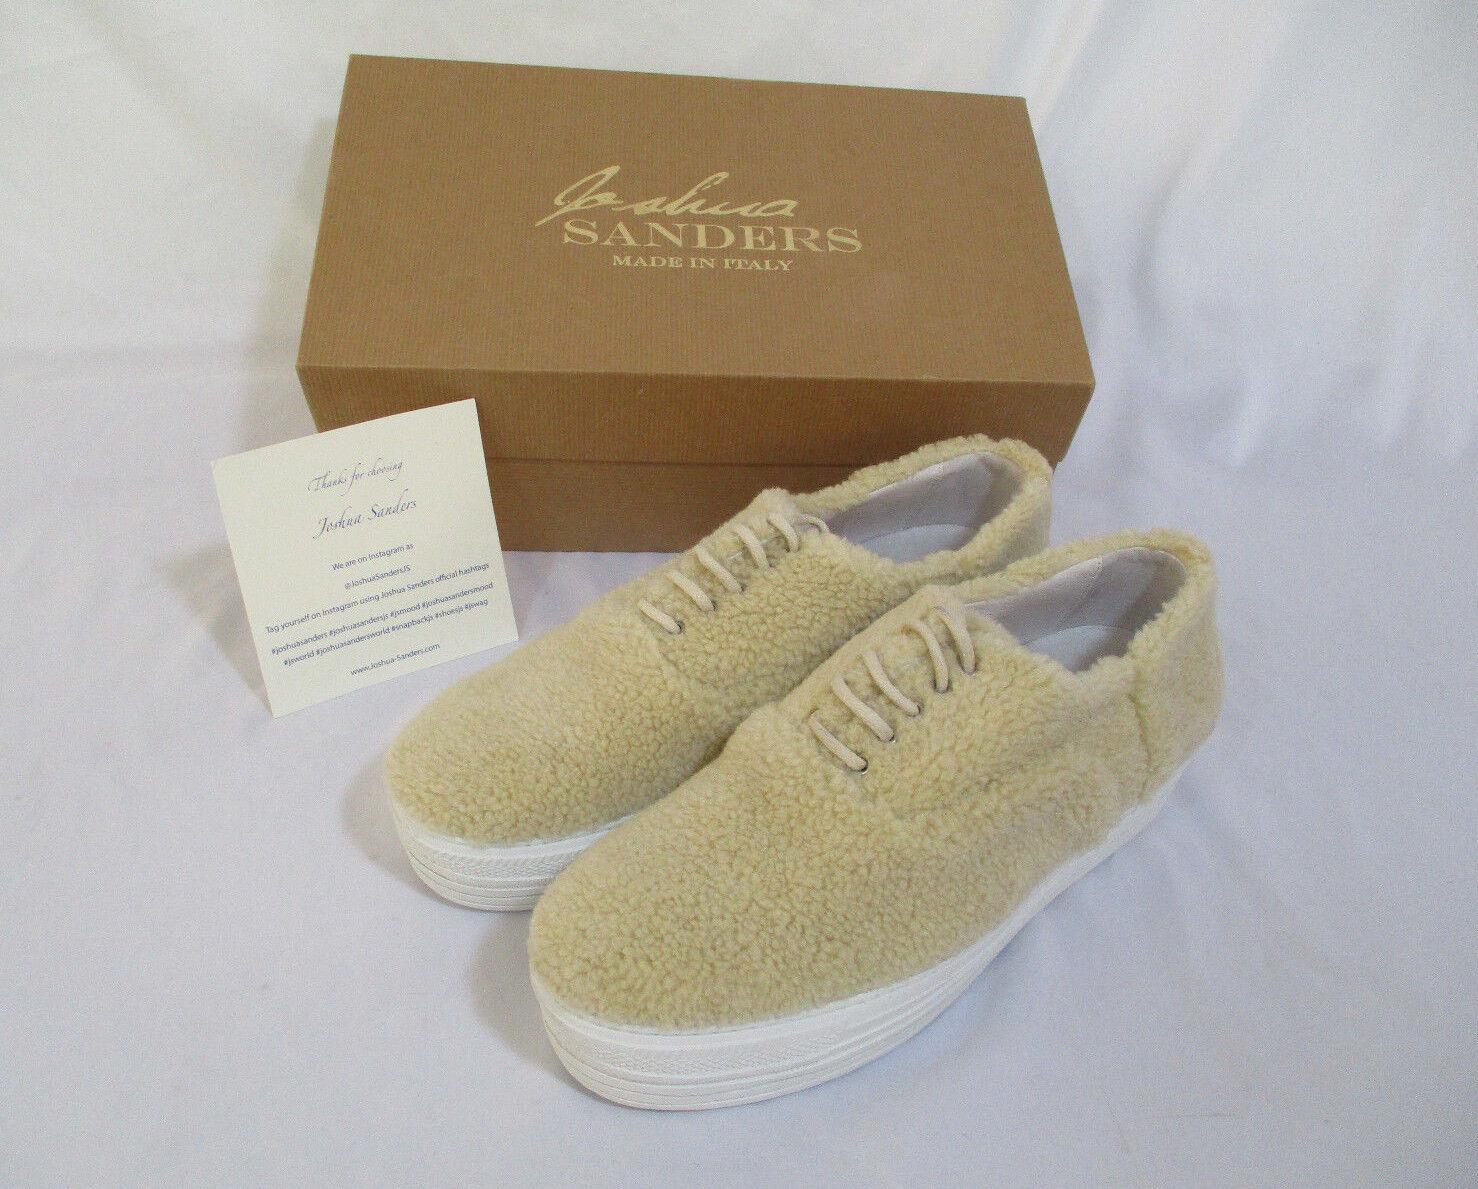 NIB Joshua Sanders Rare Celebrity Cream Shea Double Sole Shearling shoes Sz 41